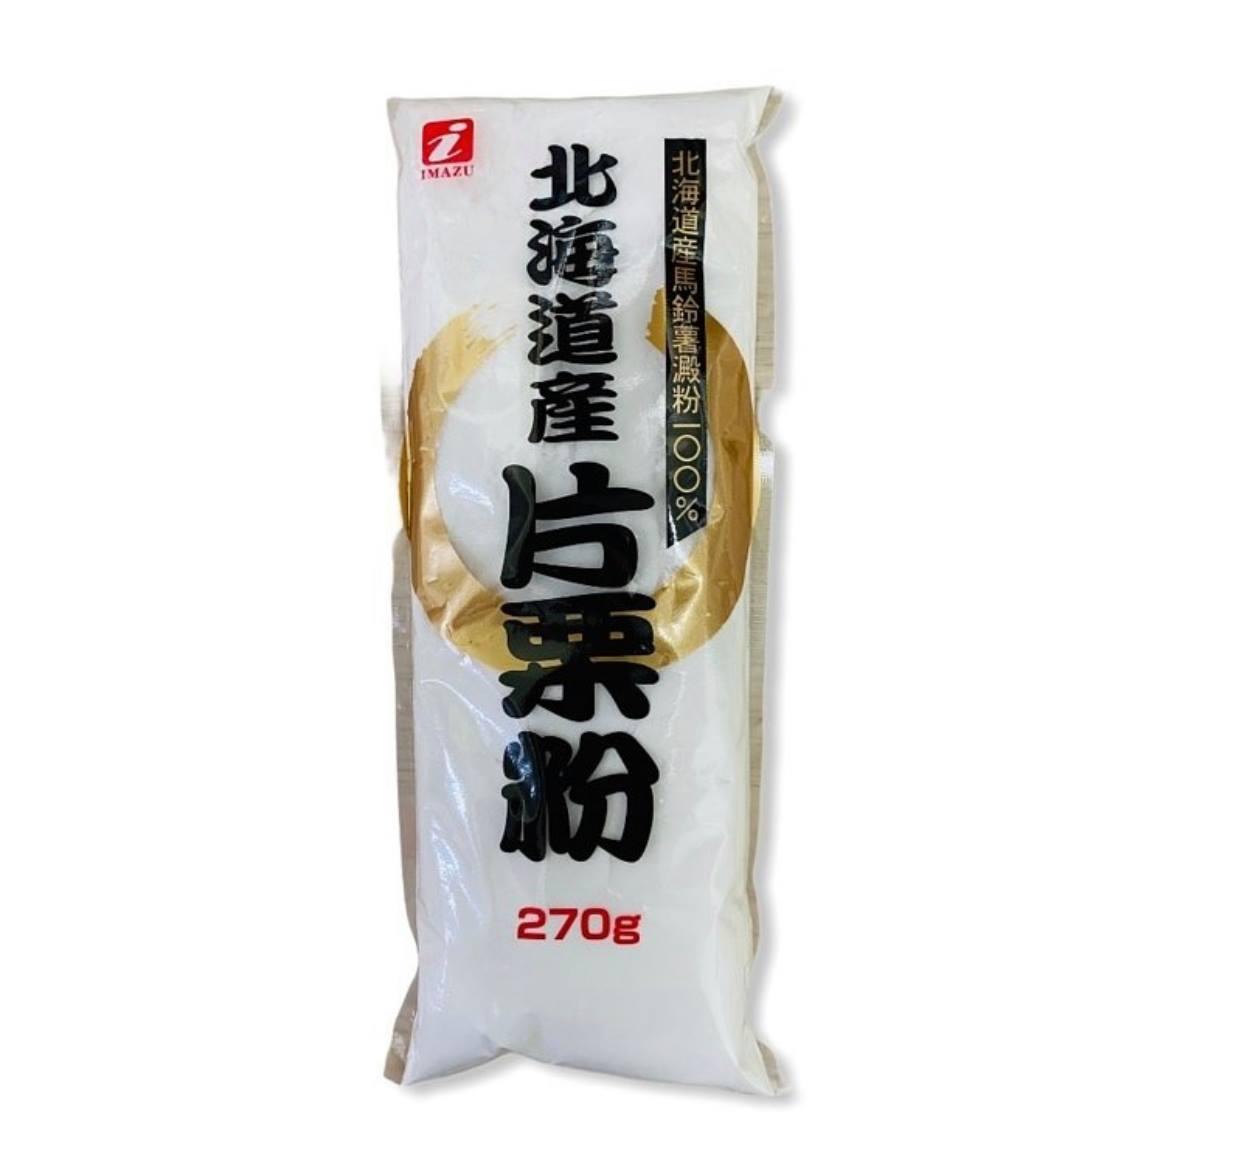 IMAZU今津 北海道產片栗粉 270g